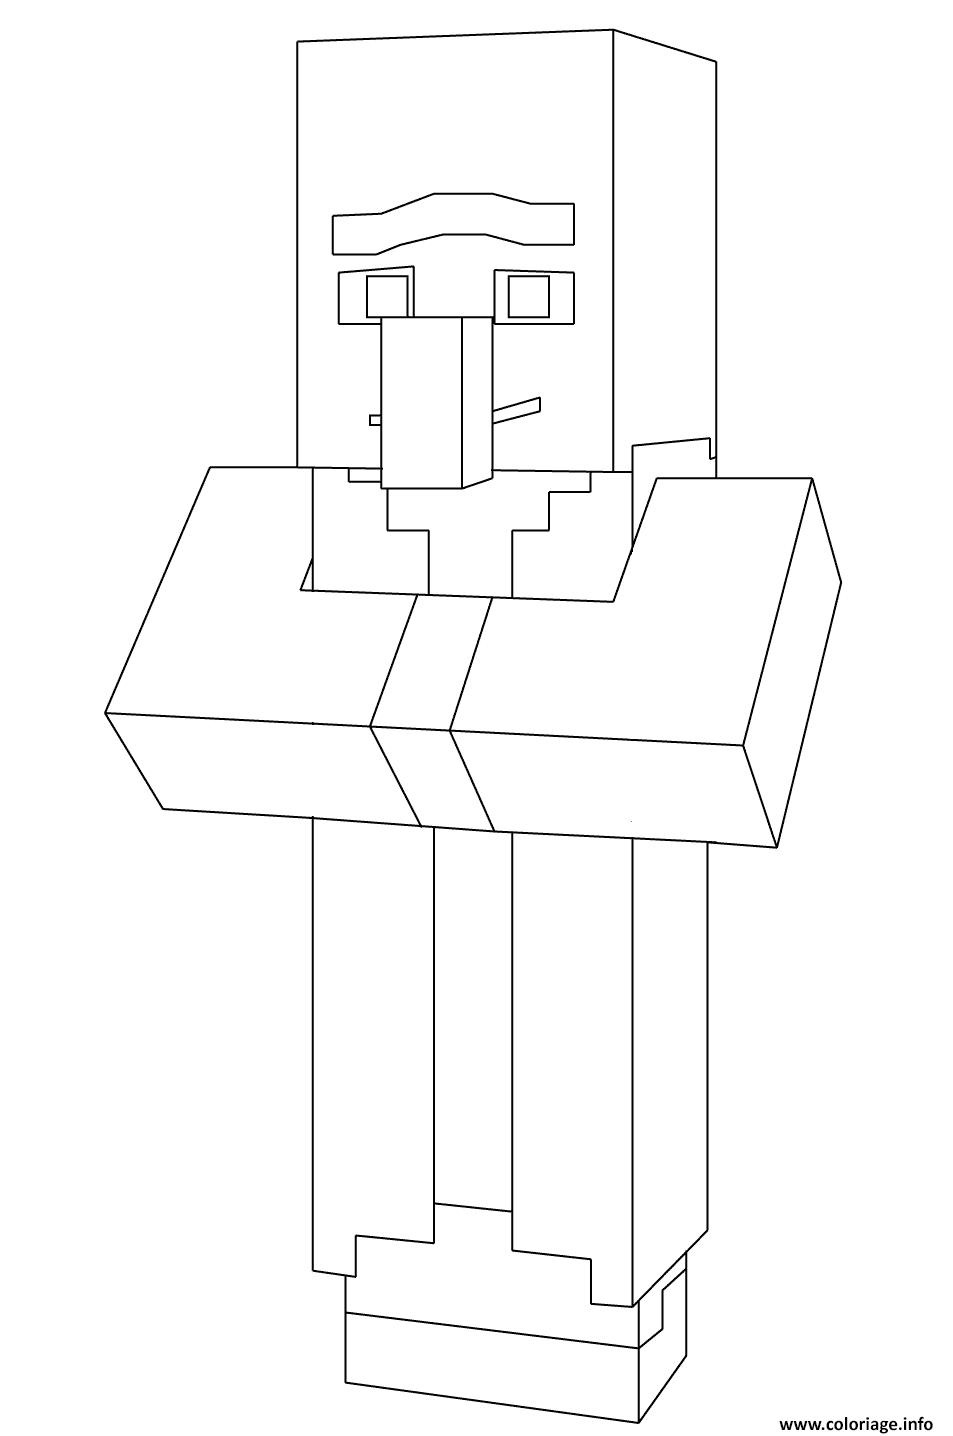 Coloriage Minecraft Villager Dessin Minecraft à imprimer